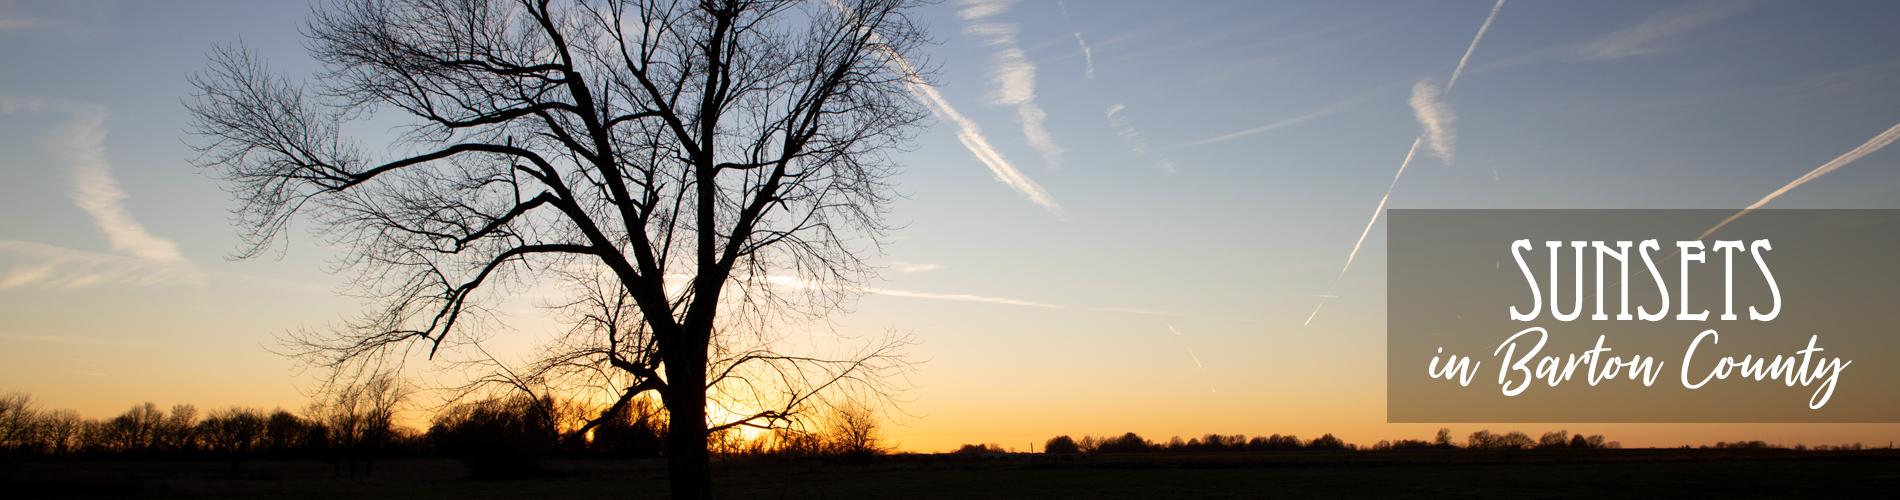 Winter Sunsets In Barton County Missouri